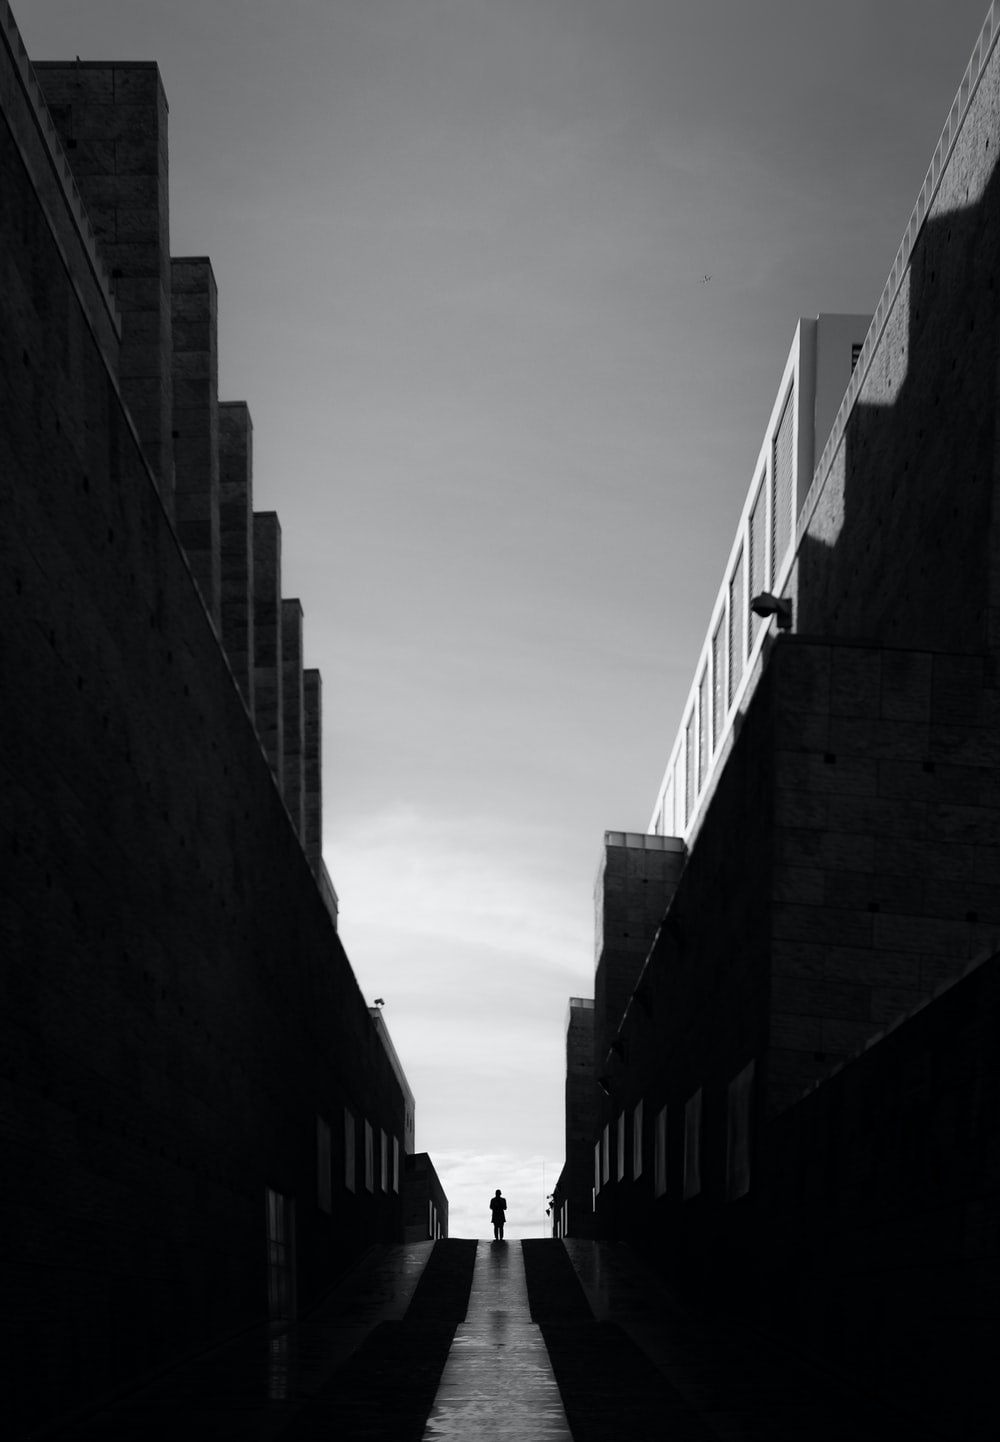 greyscale photo of pathway between buildings